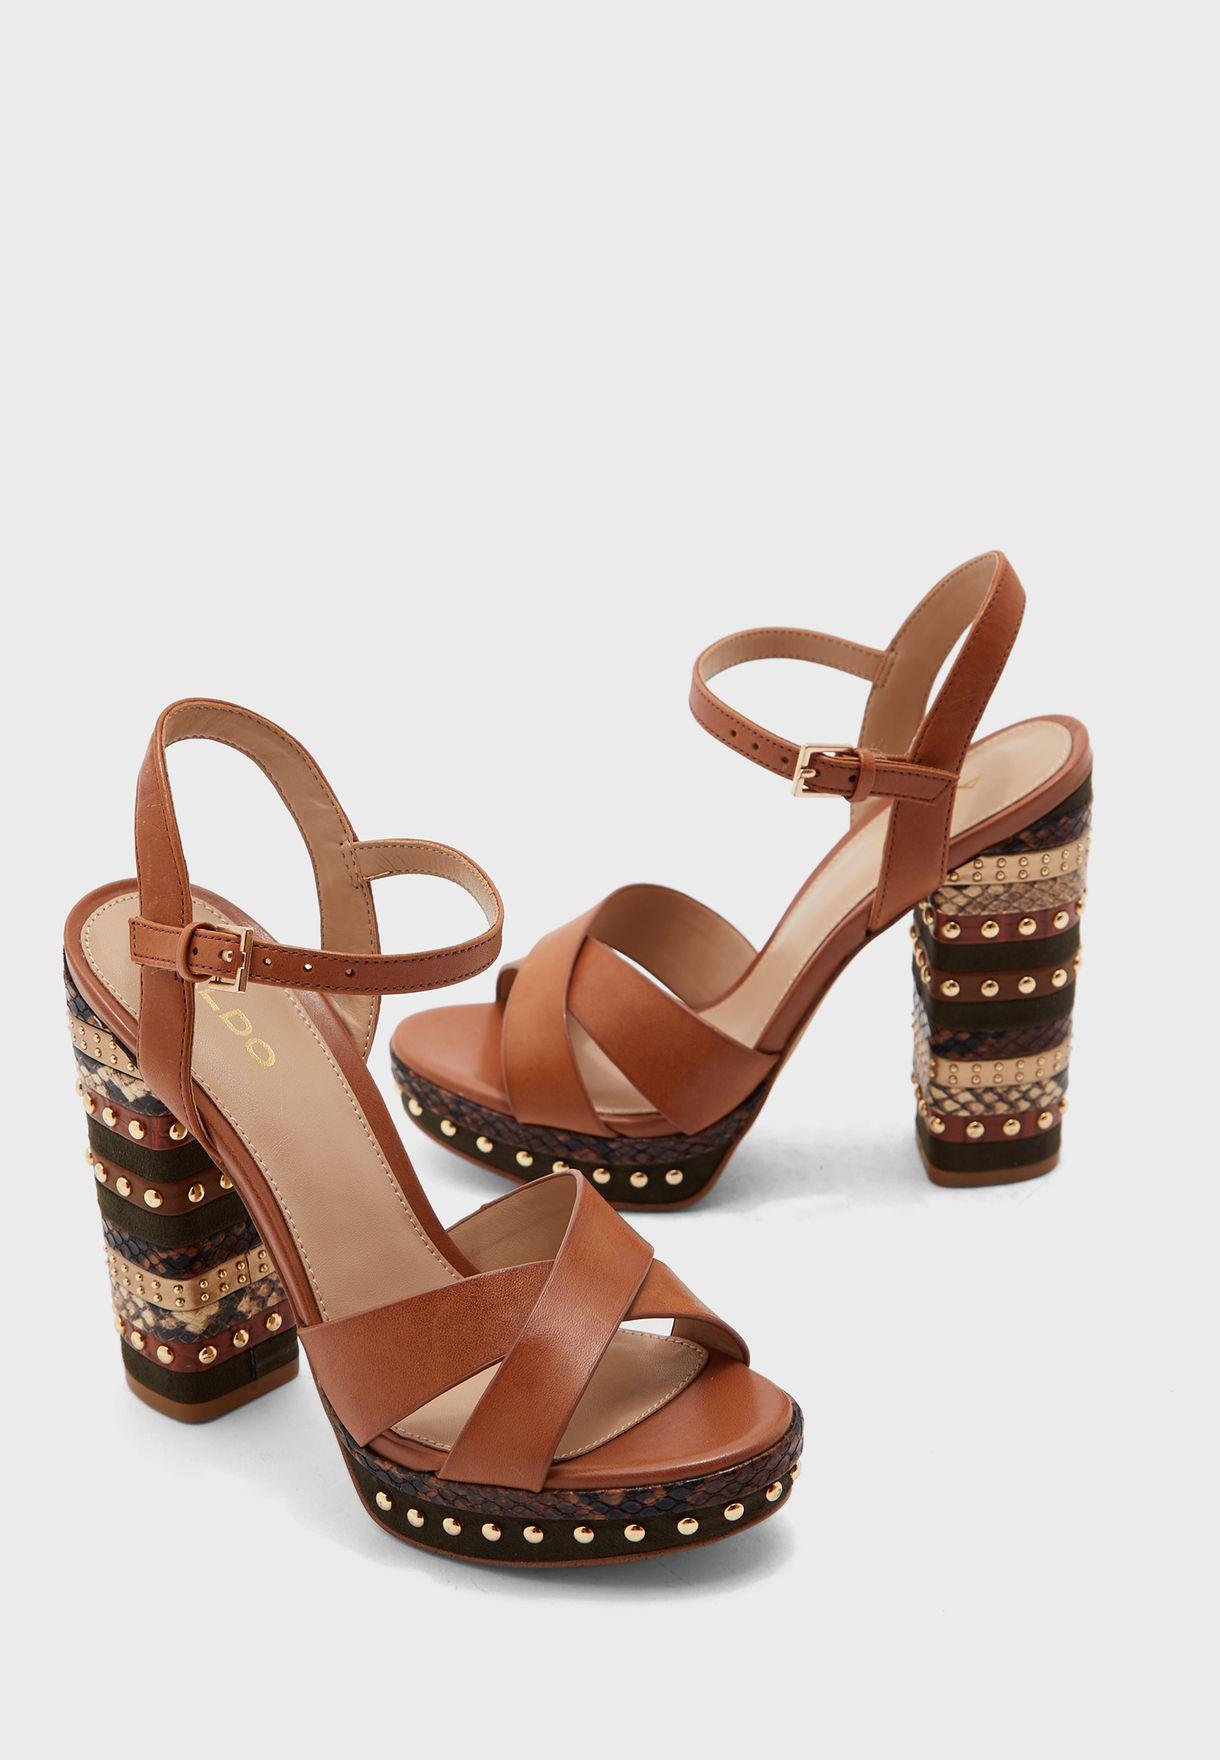 Galaecia Ankle Strap Sandal - Brown